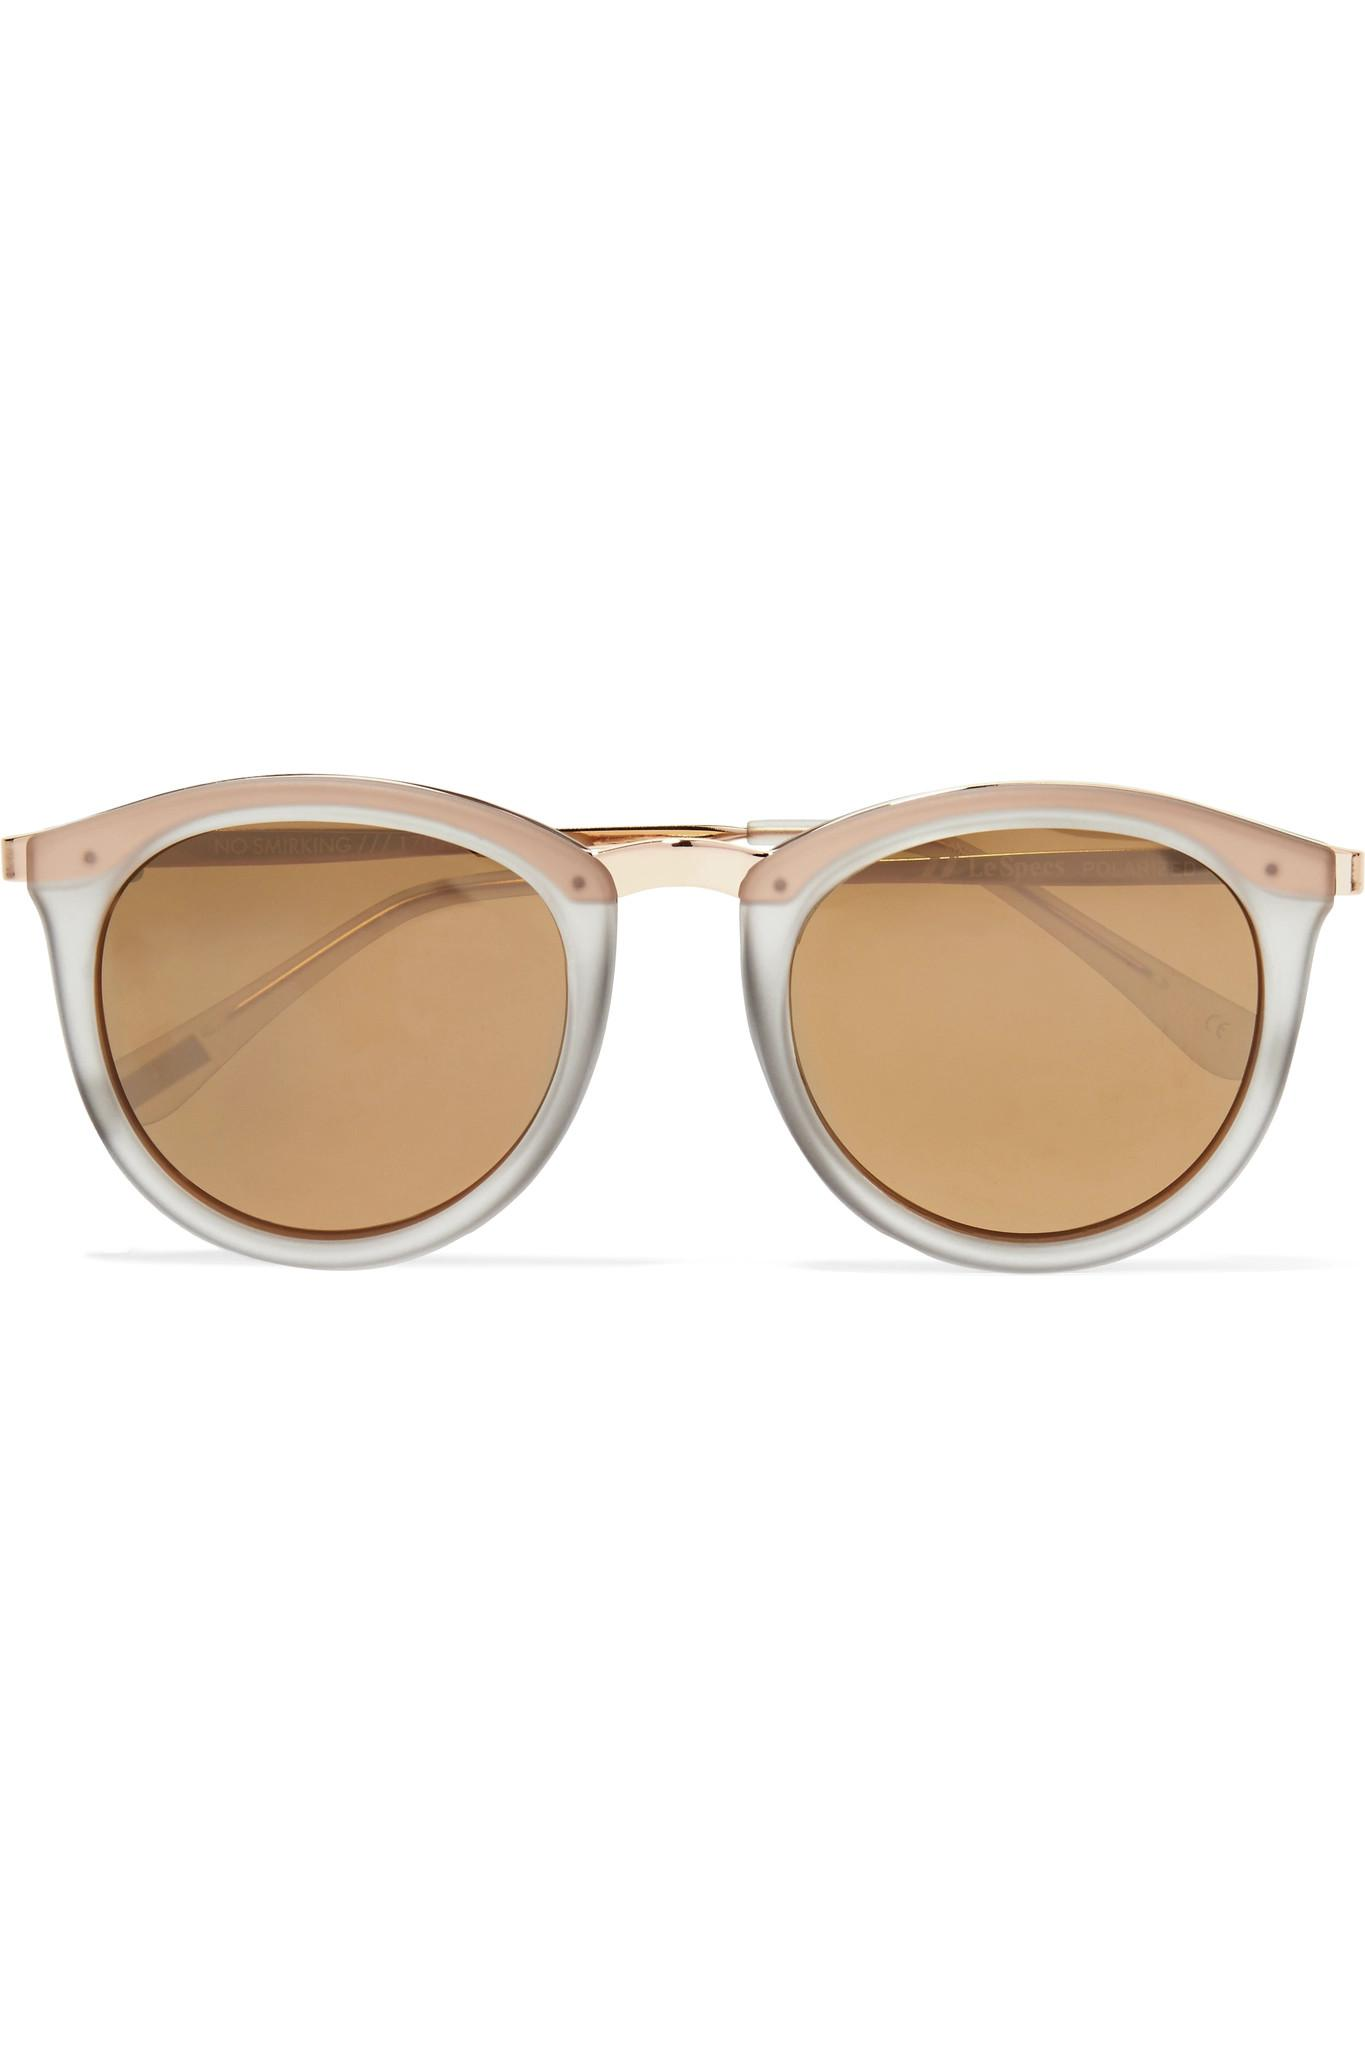 ab23df03db Le Specs. Women s Metallic No Smirking Round-frame Acetate Mirrored  Sunglasses